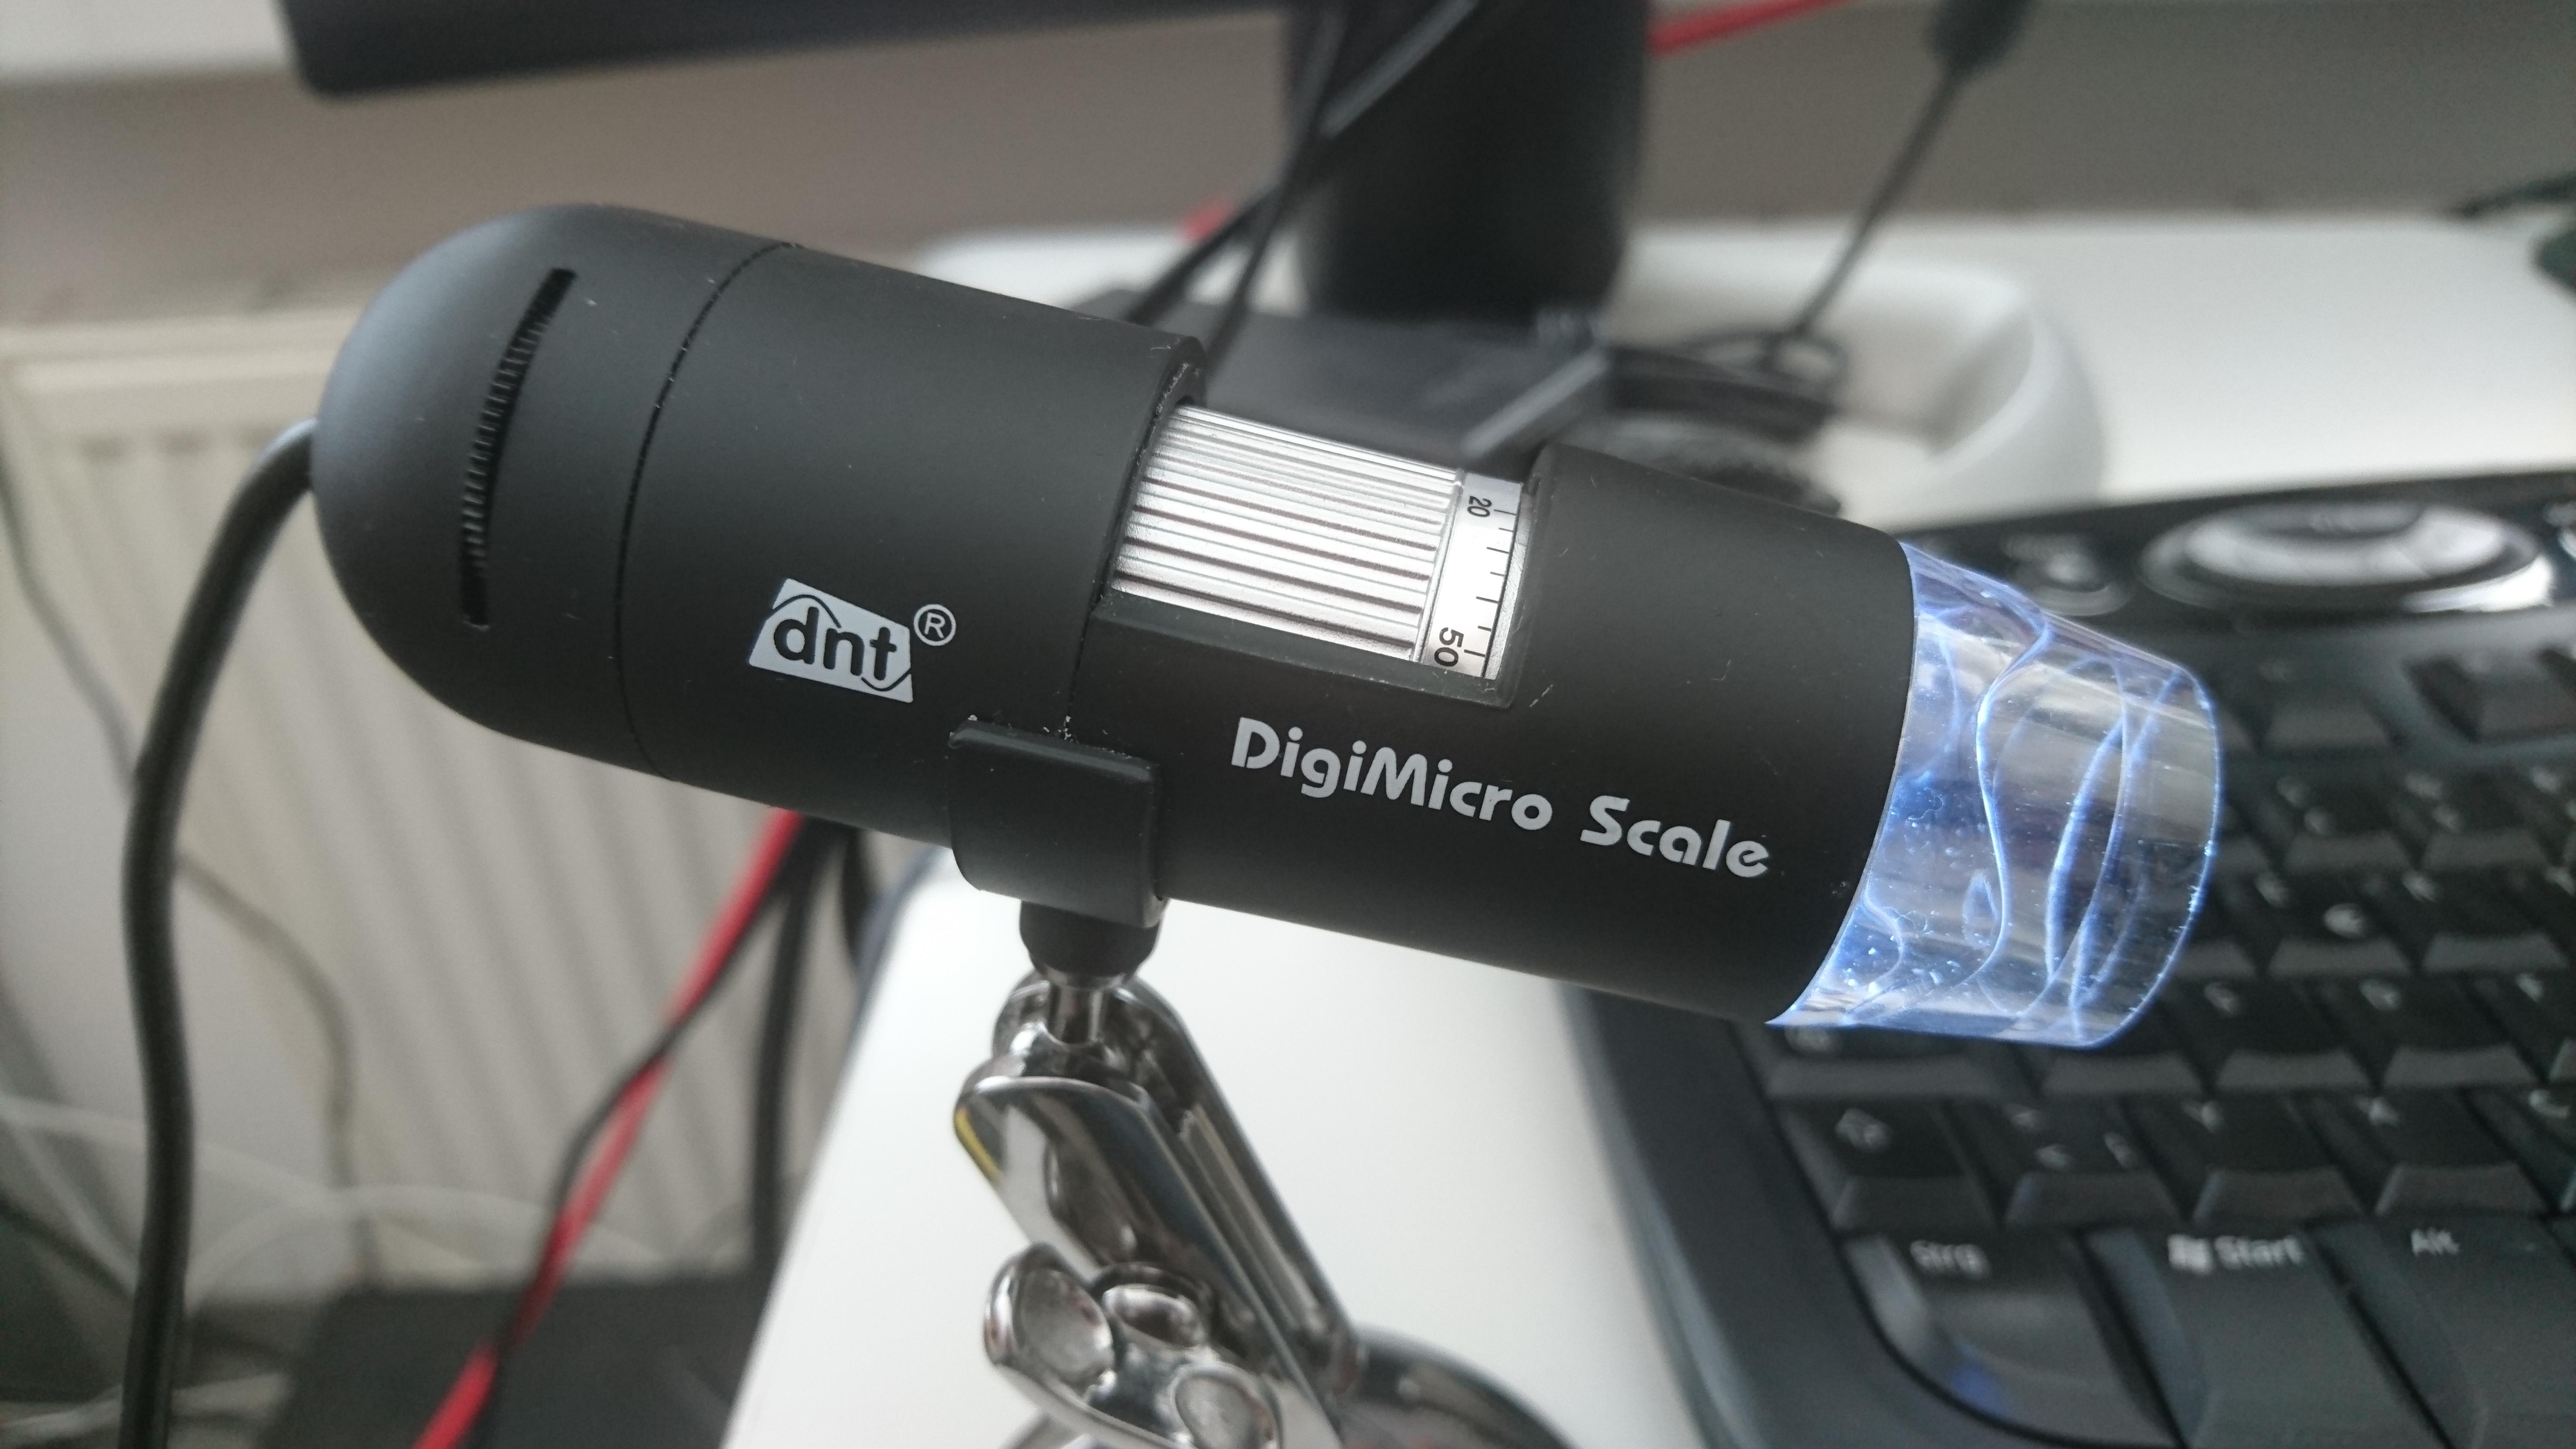 Usb camera an raspberry pi mit osd ingmars retroblog